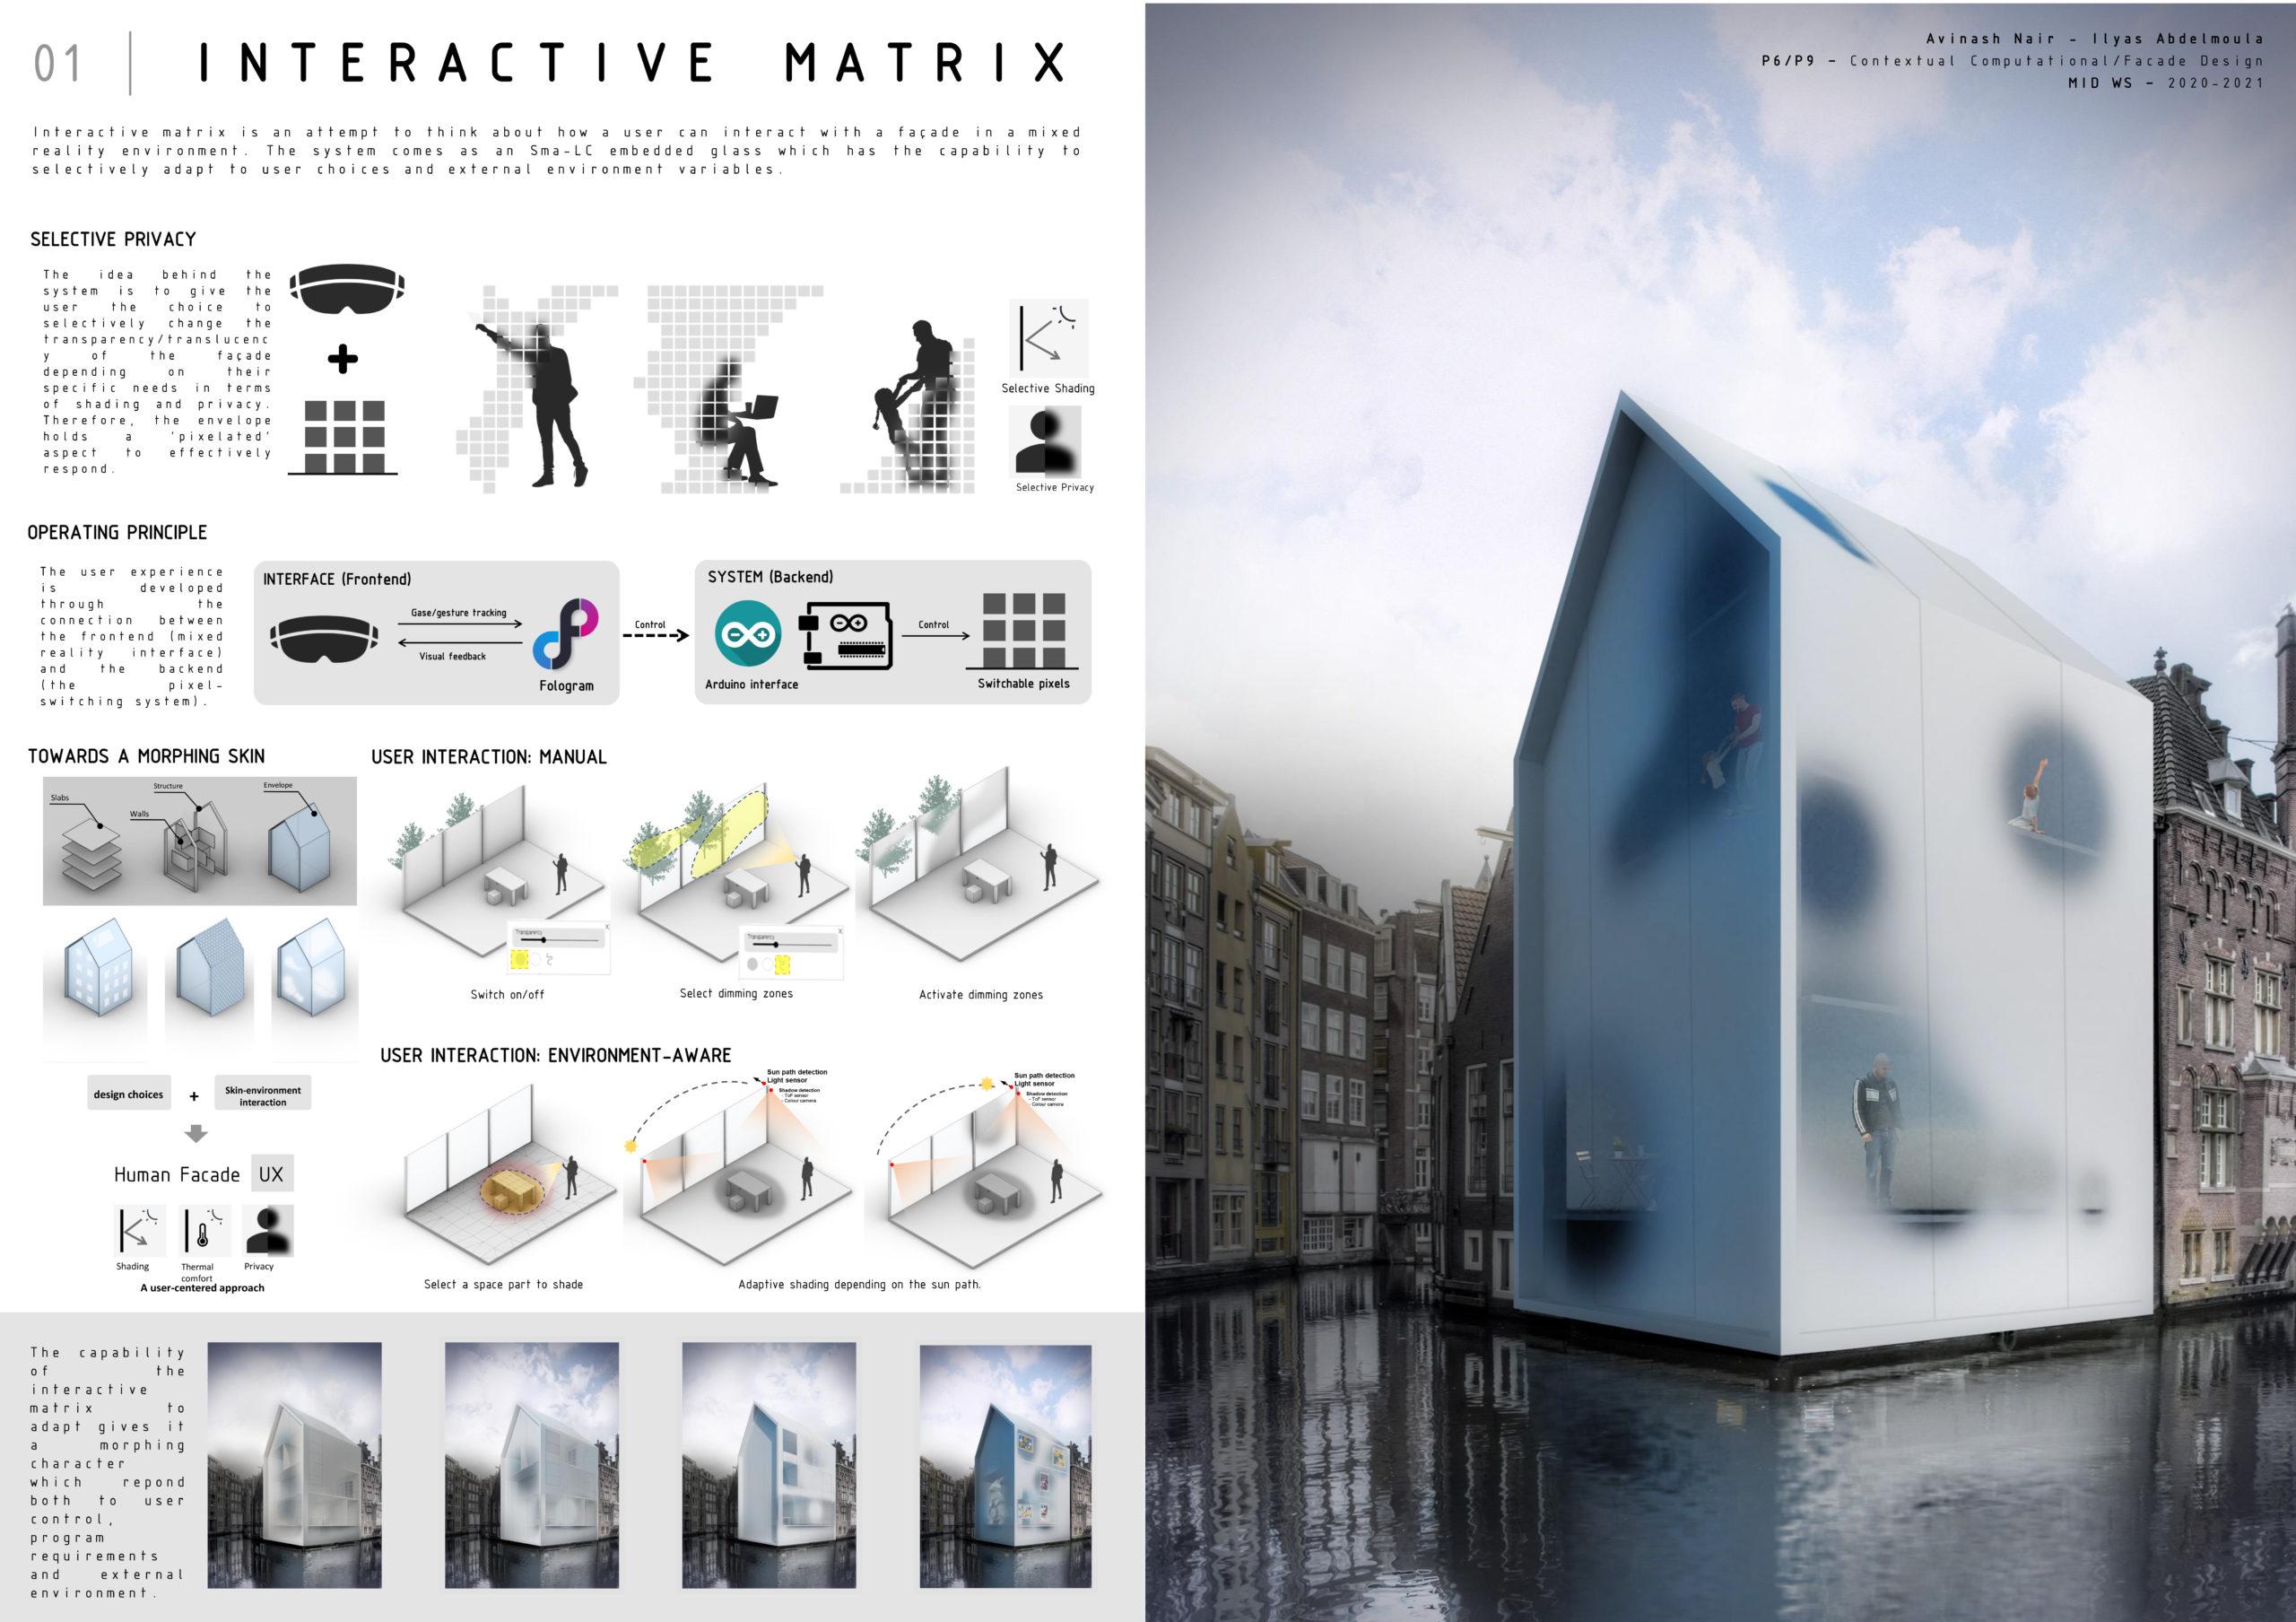 Interactive Matrix // Avinash Nair – Ilyas Abdelmoula